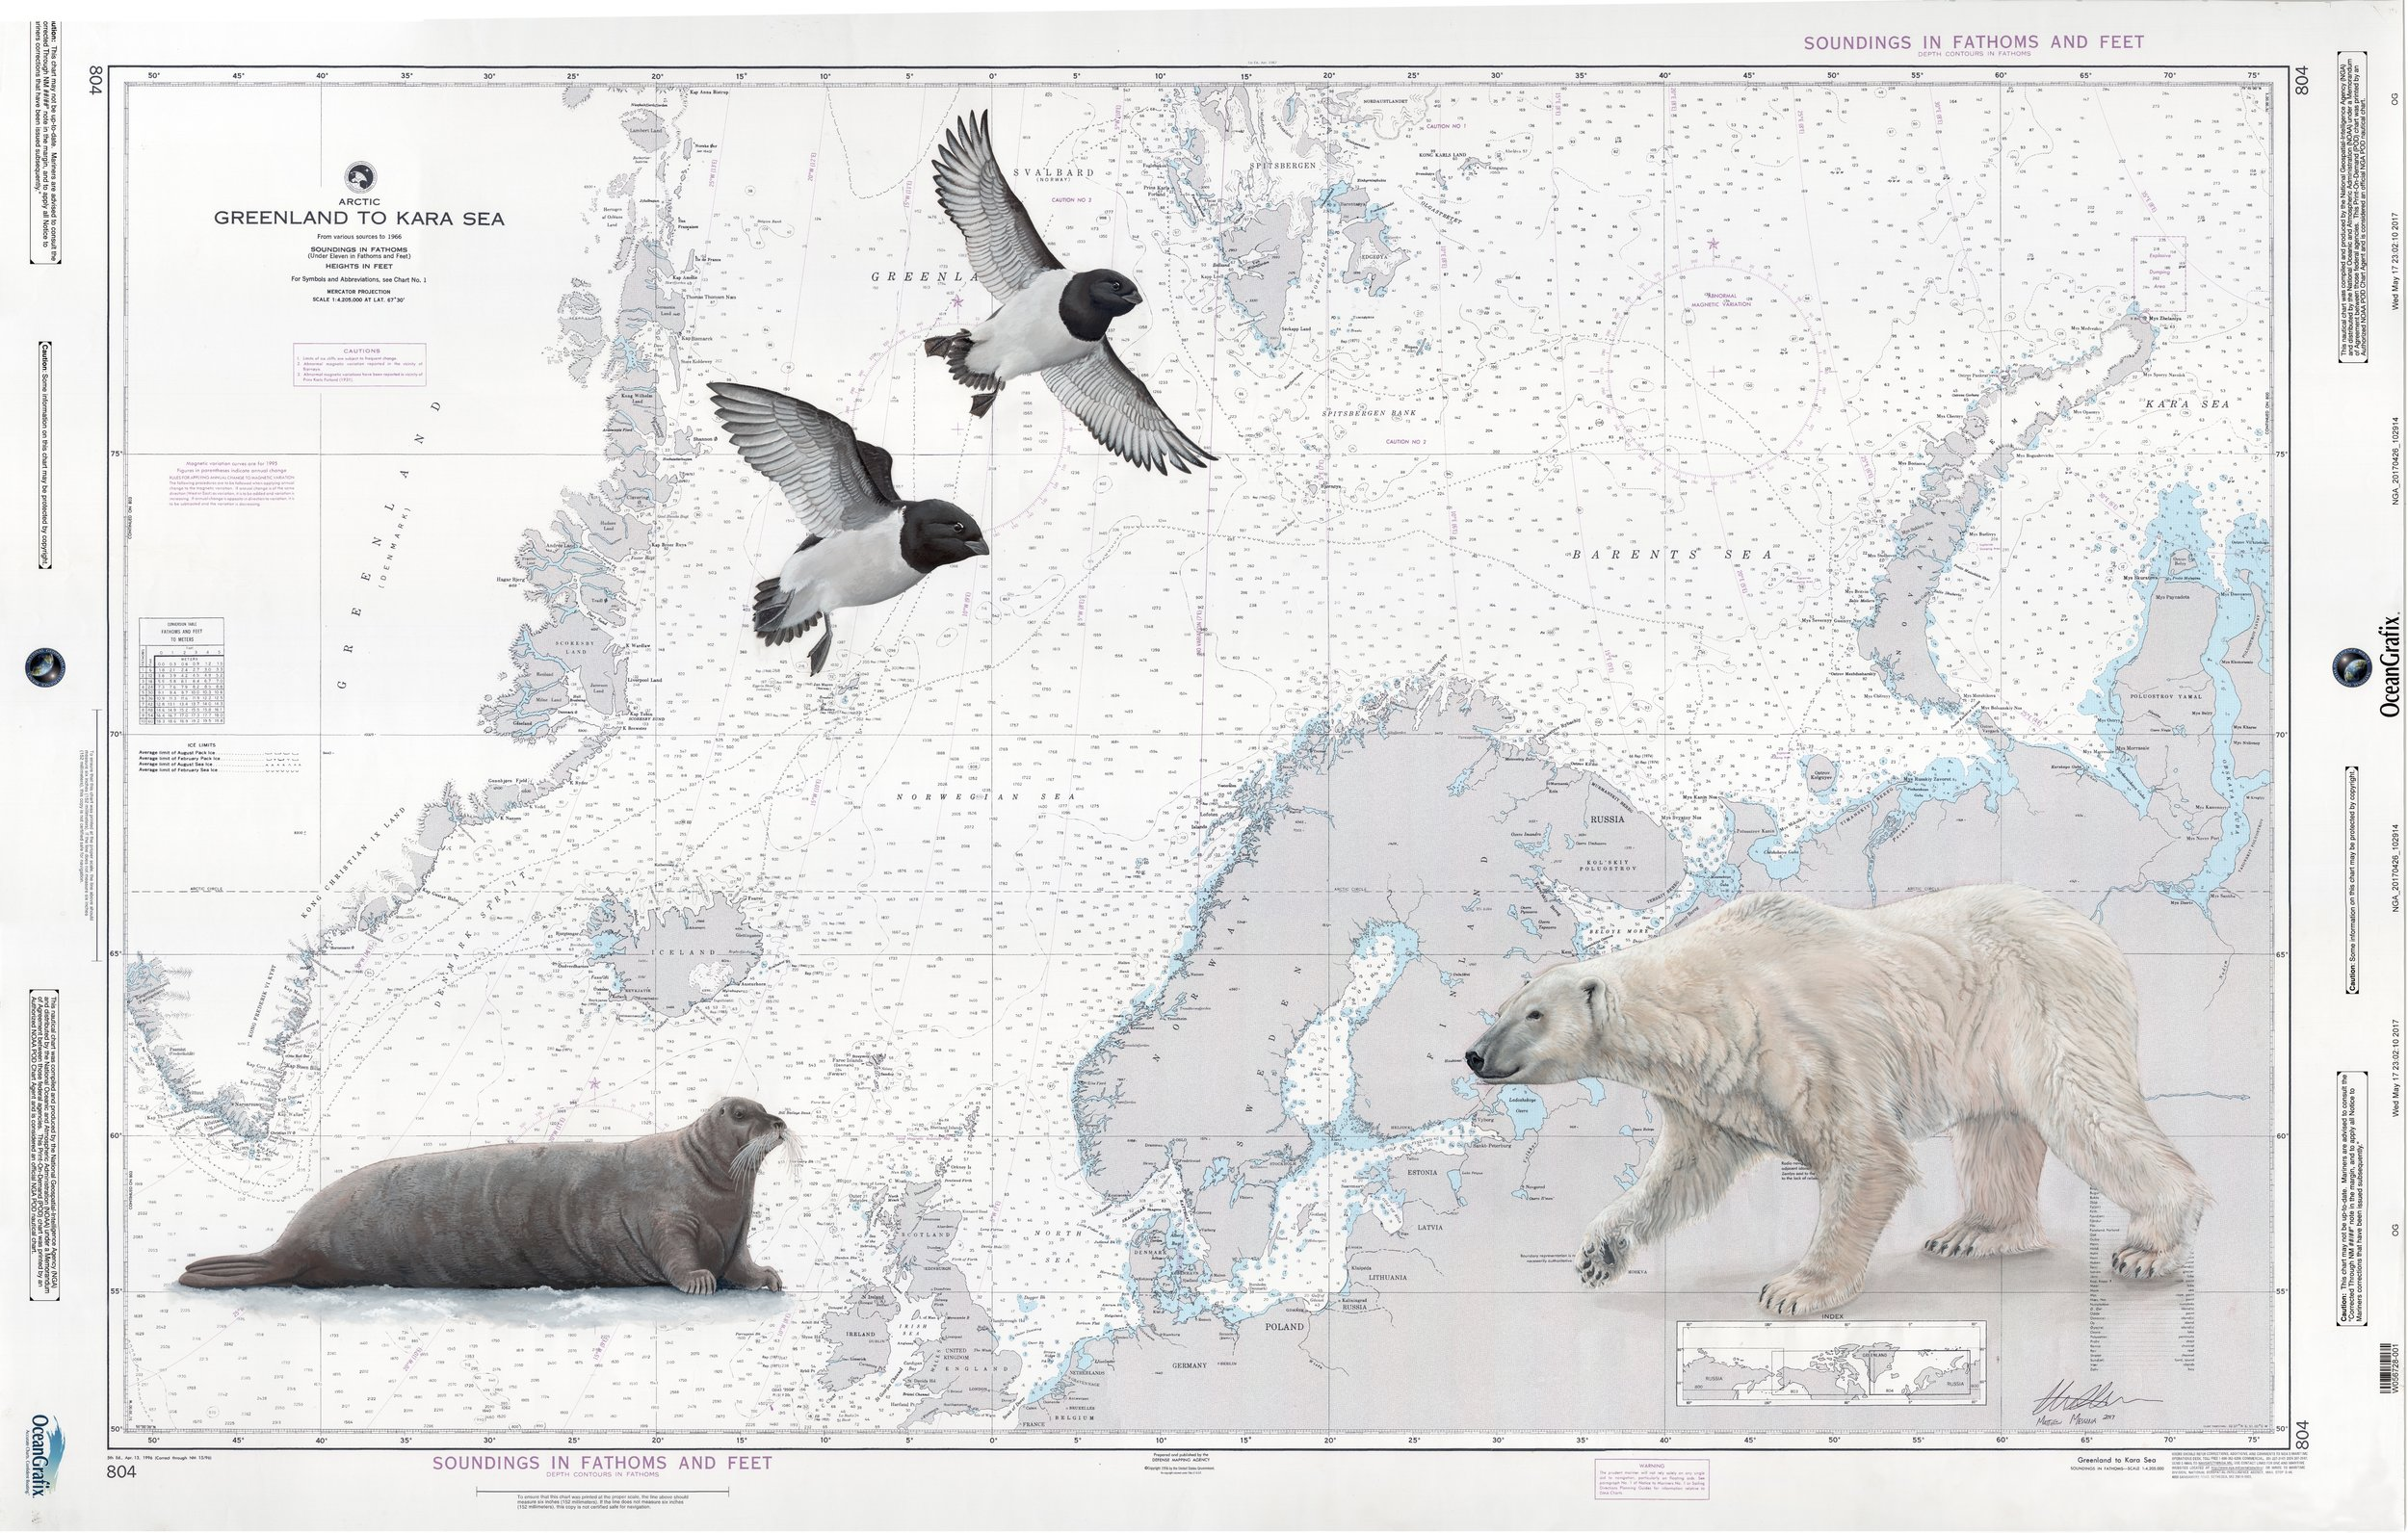 European Arctic Chart - $2000